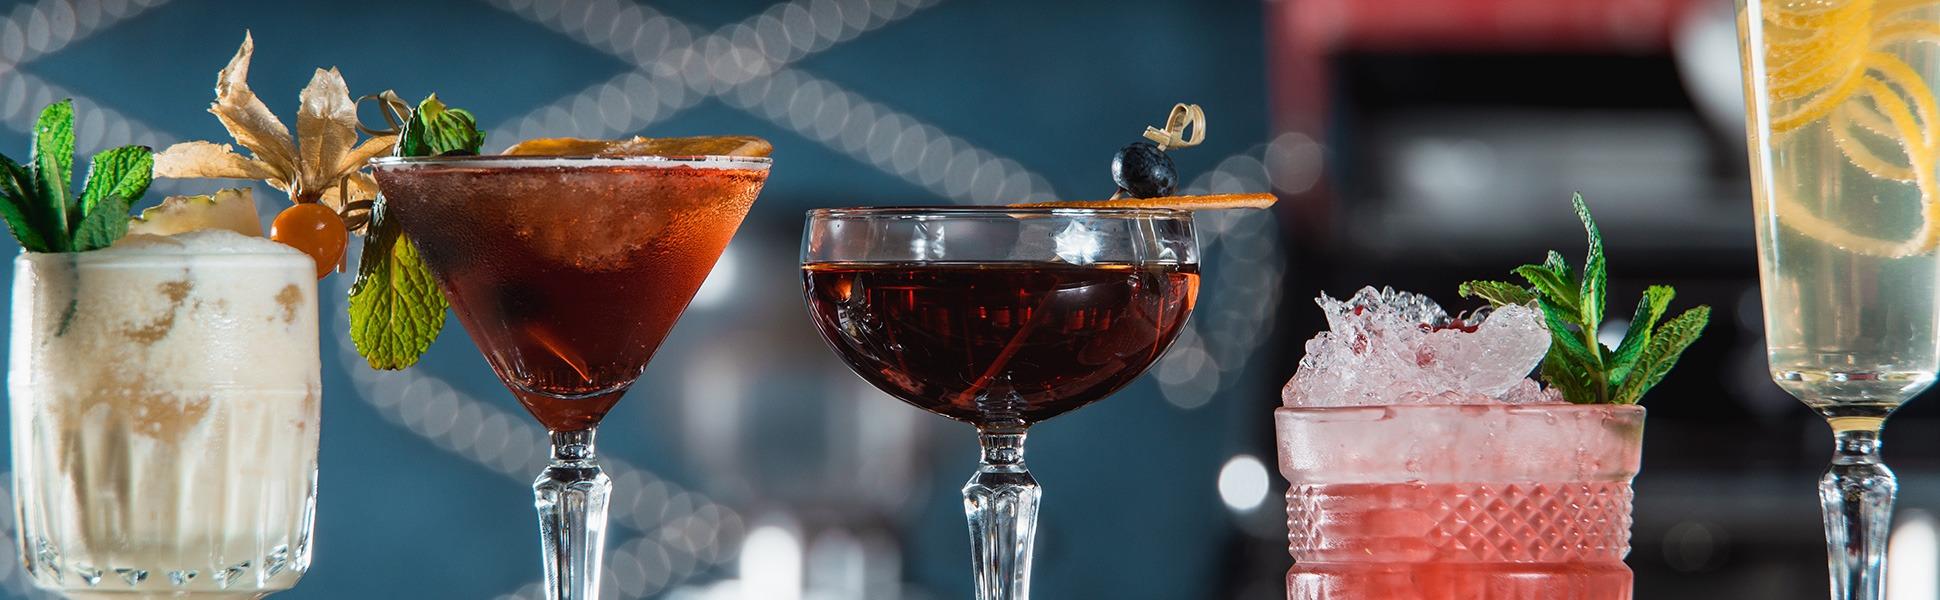 Wines, Spirits & Cocktails